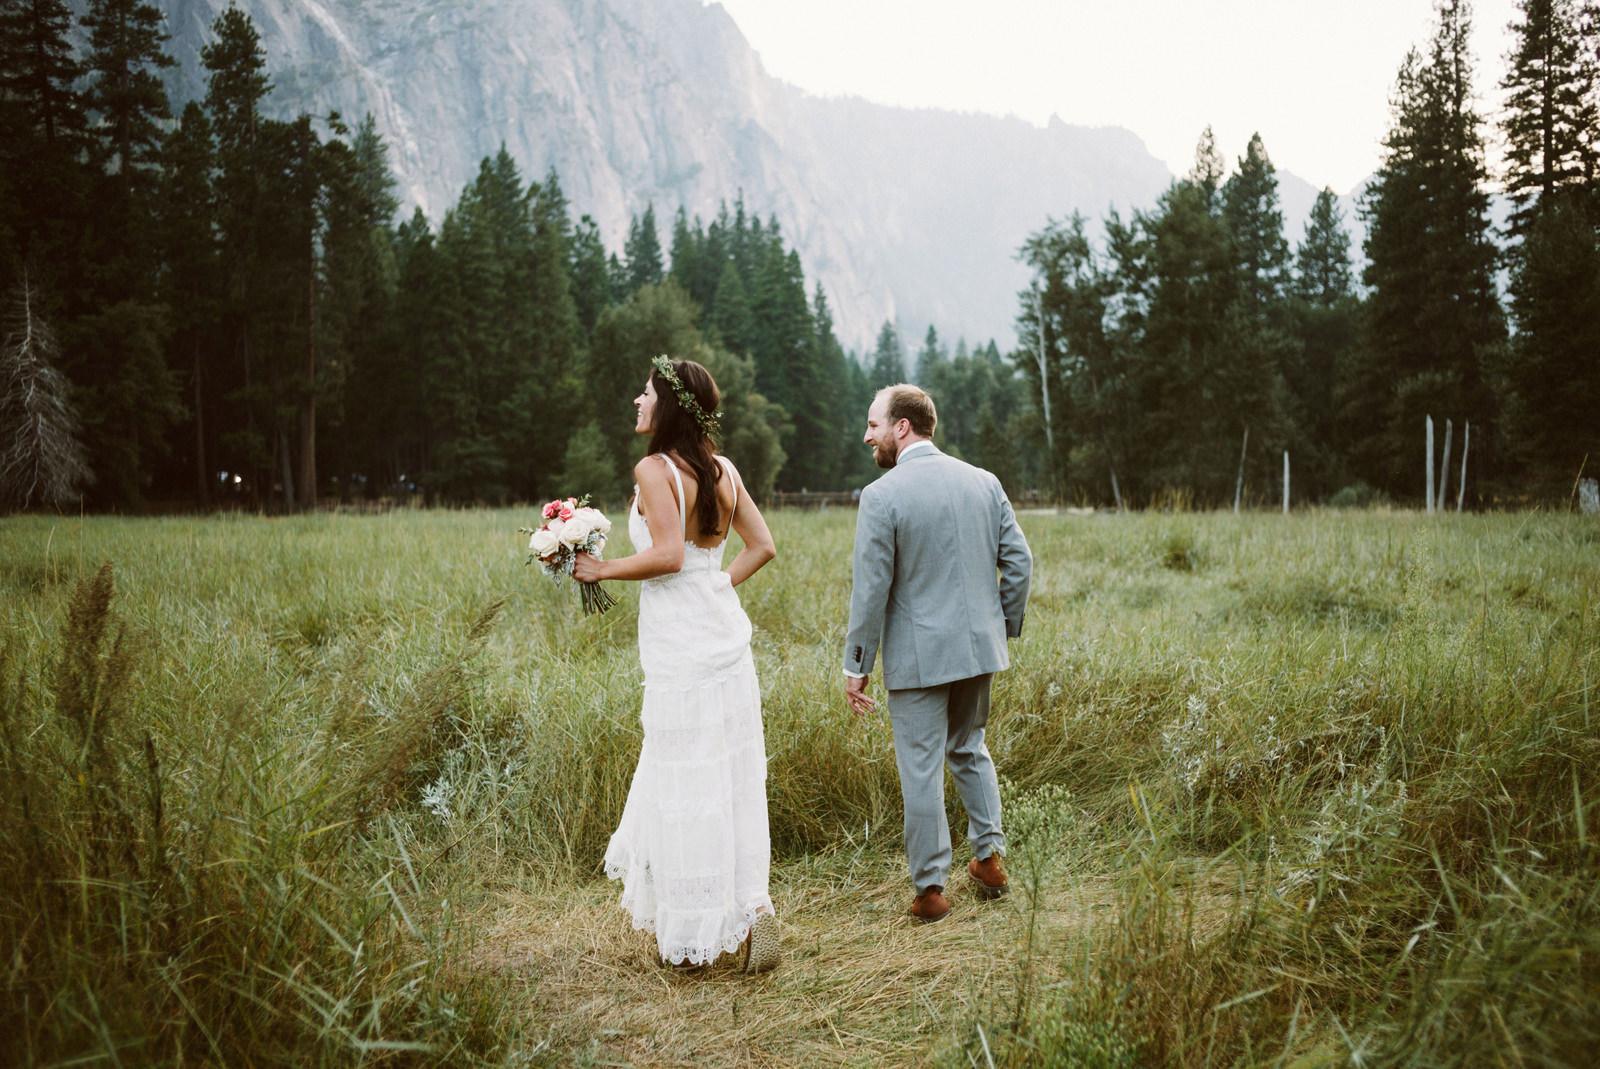 yosemite-intimate-wedding-097 YOSEMITE INTIMATE WEDDING